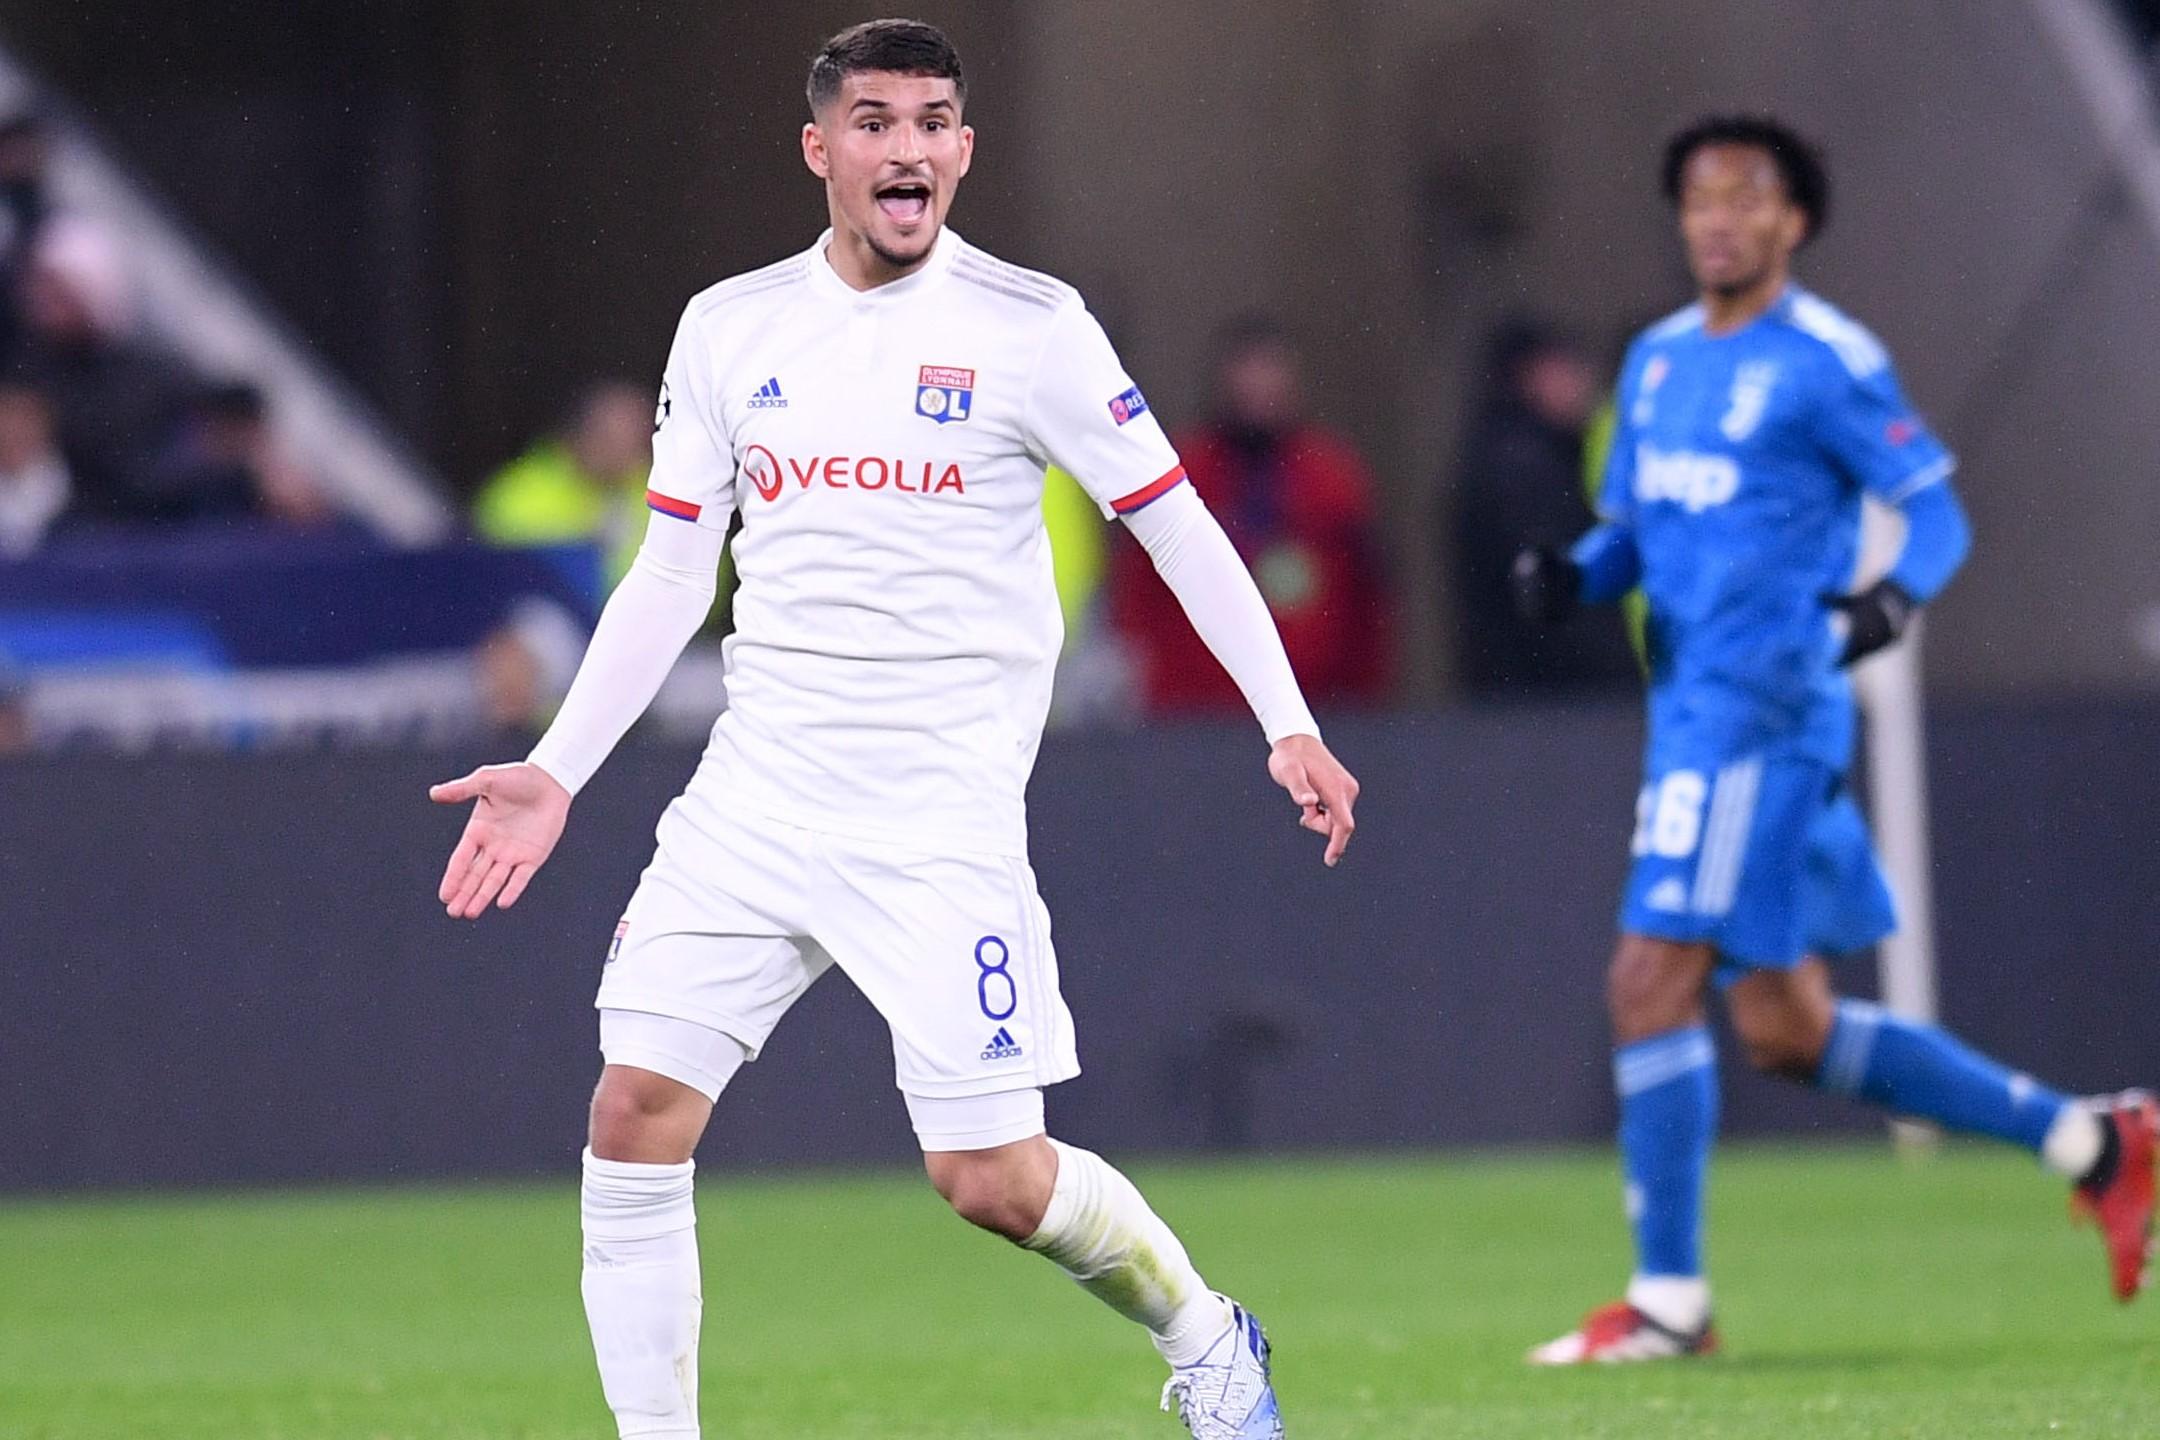 Football - Transferts - Le journal du mercato : la Juve lorgne les Lyonnais Aouar et Cherki